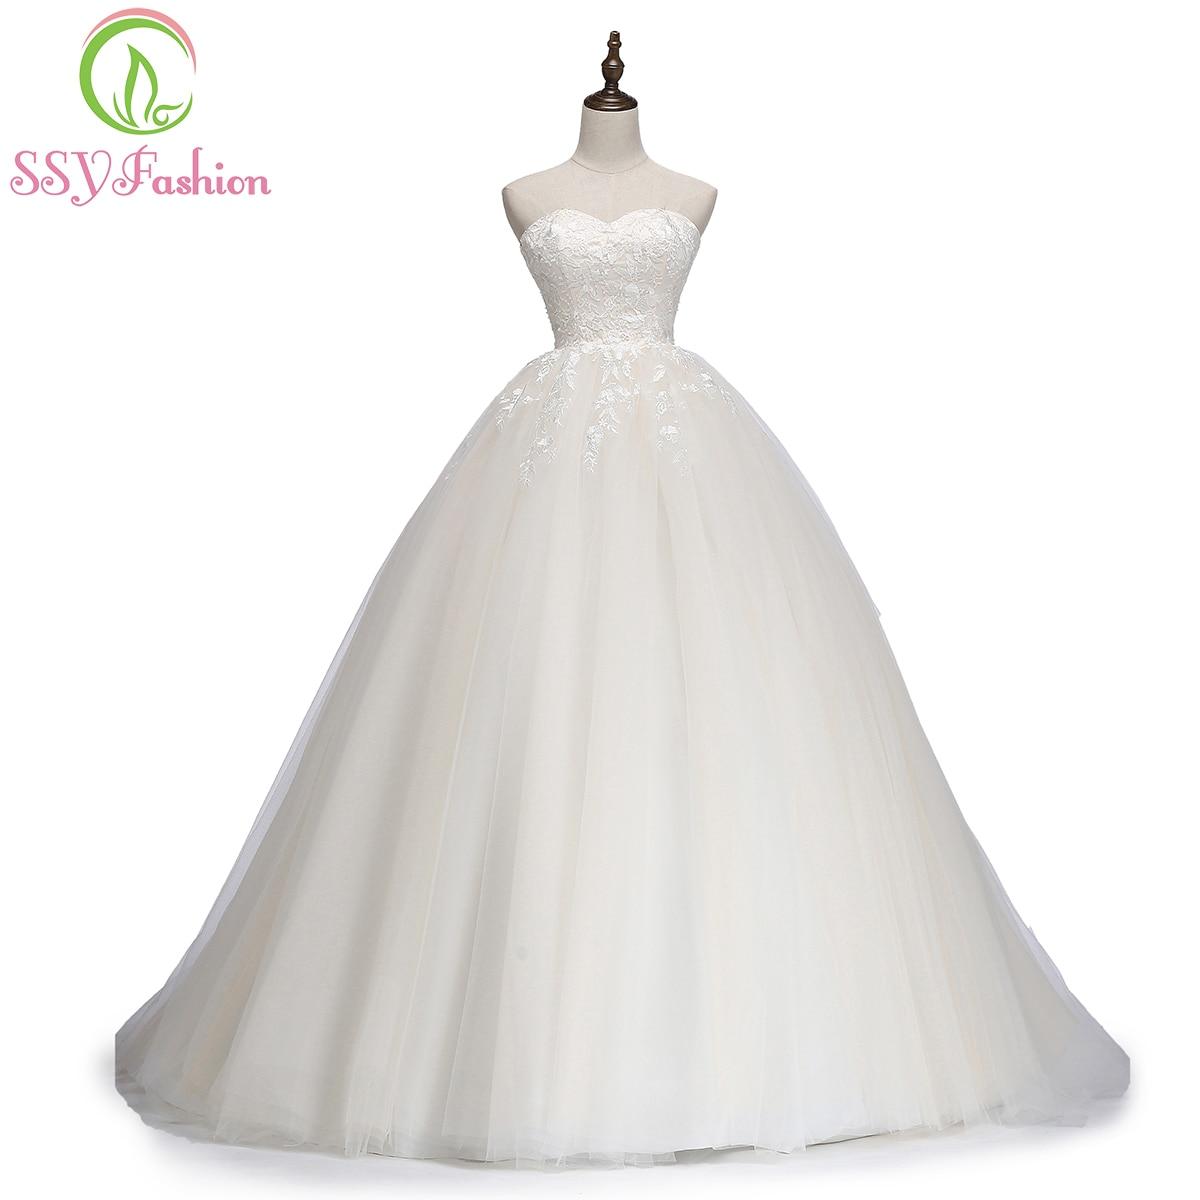 Ssyfashion Long Sleeve Wedding Dresses The Bride Elegant: SSYFashion New Simple Elegant Champange Lace Wedding Dress